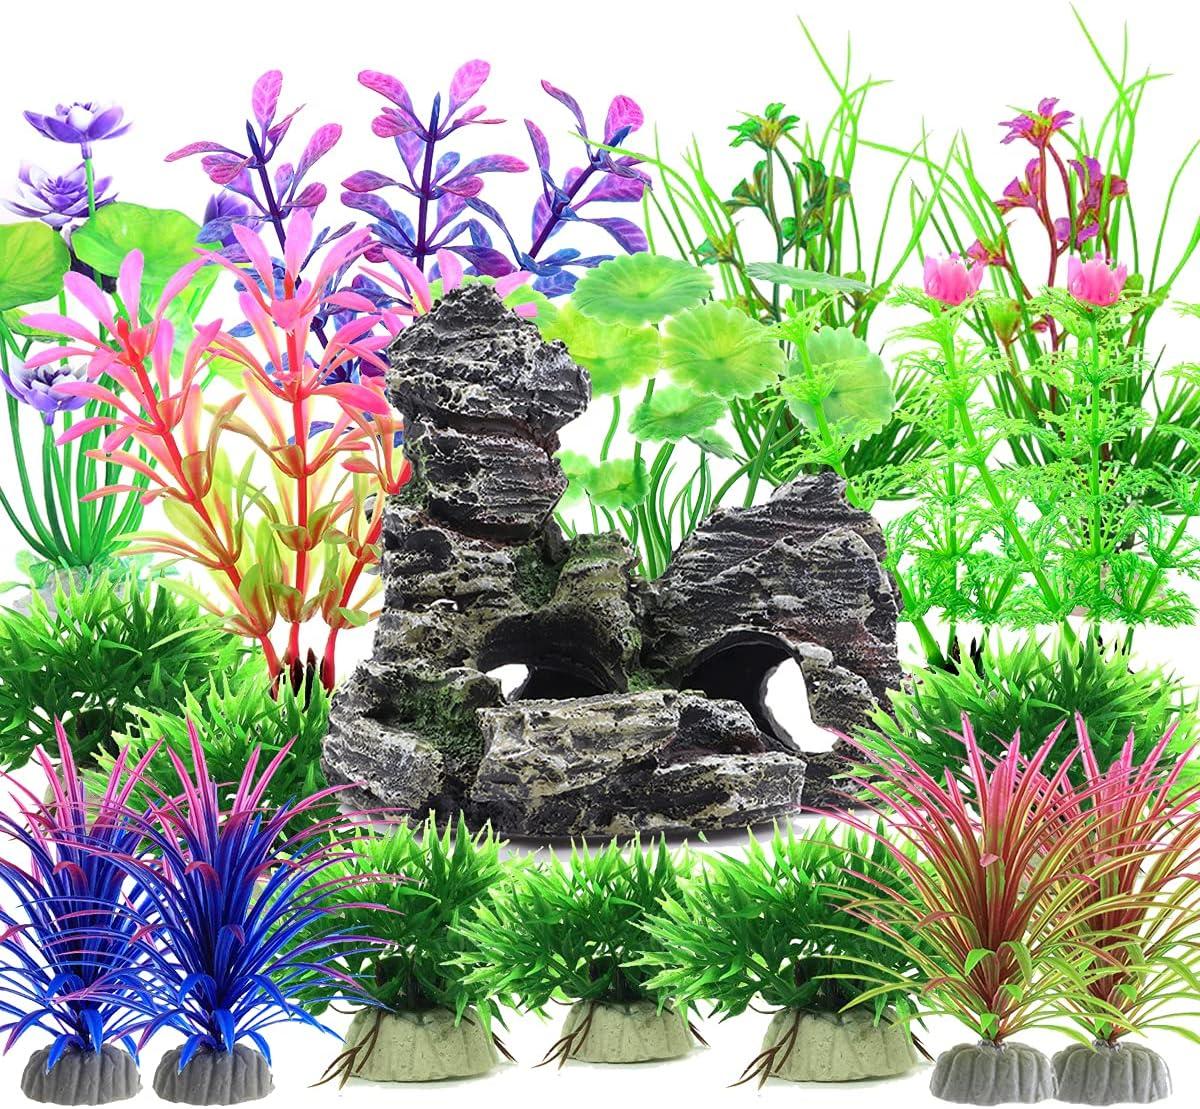 Pianta Piante Artificiali Acquario Kit, Vibury 28 Pezzi Ornamento Paesaggio Grotta Acquario Decoro Plantes d'ornement pour aquarium